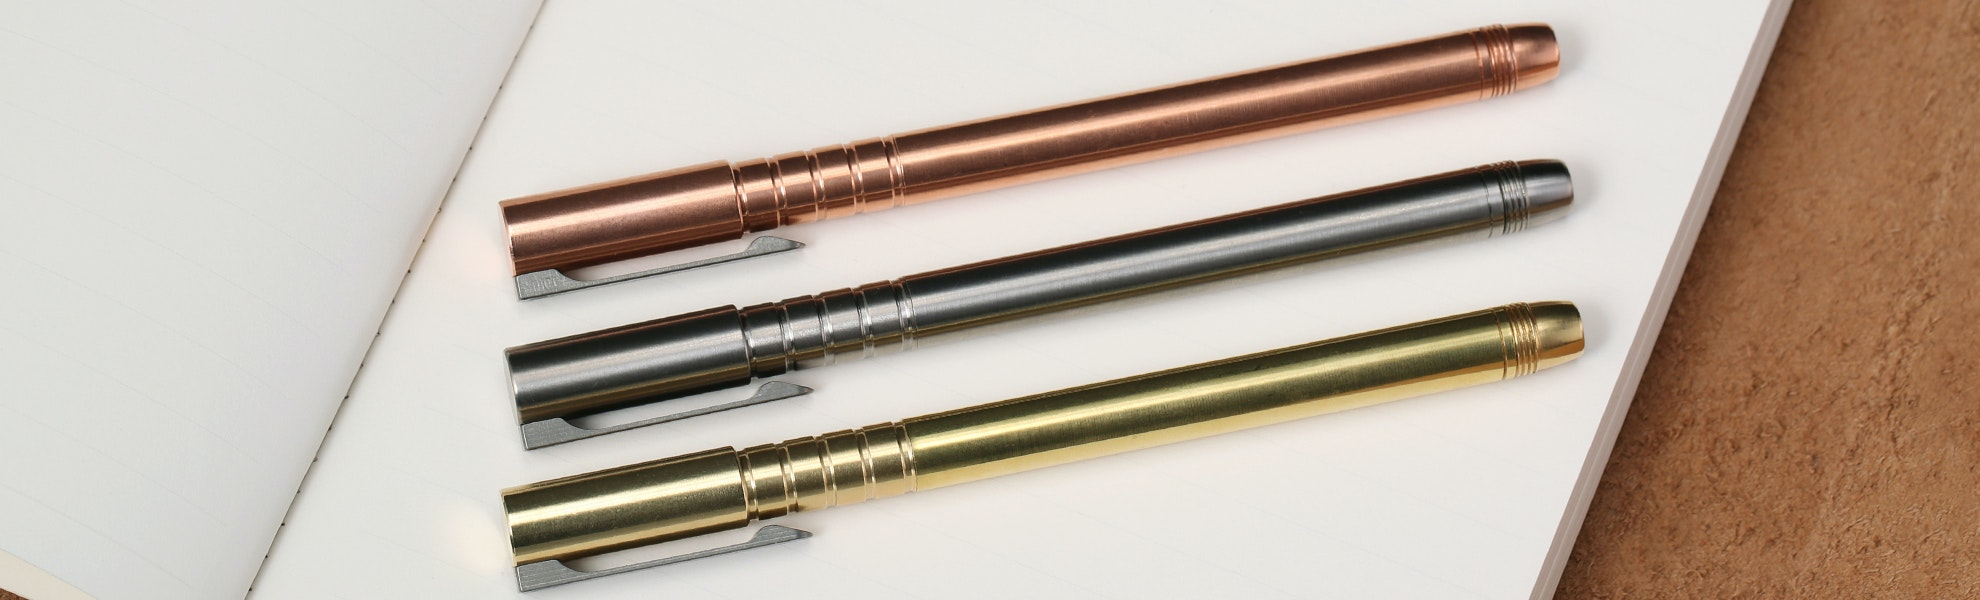 Urban Survival Gear TiScribe Machined Pens